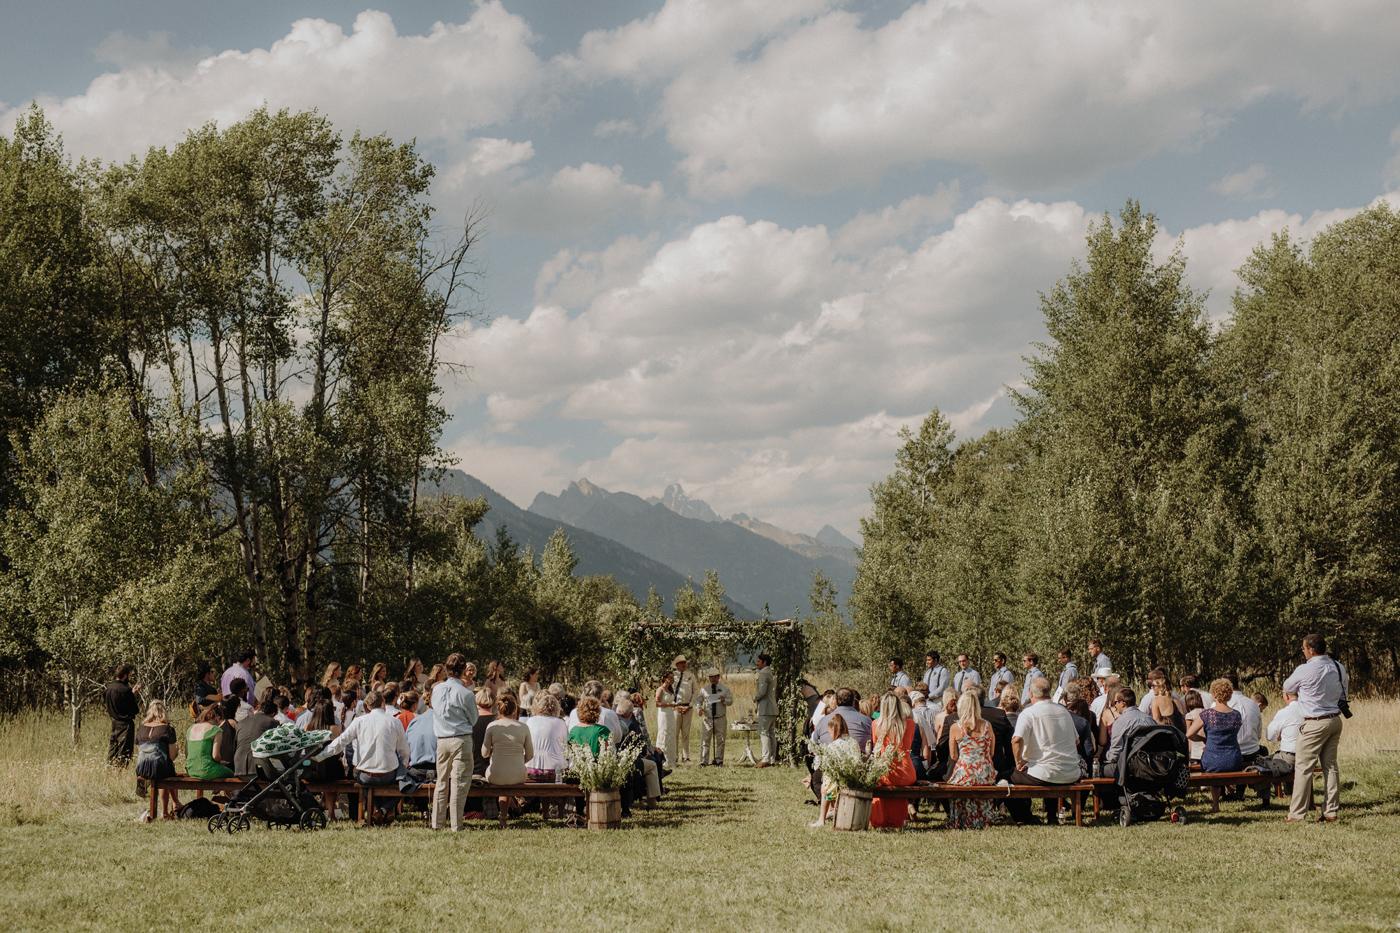 026-grand-teton-jackson-hole-wyoming-wedding.jpg